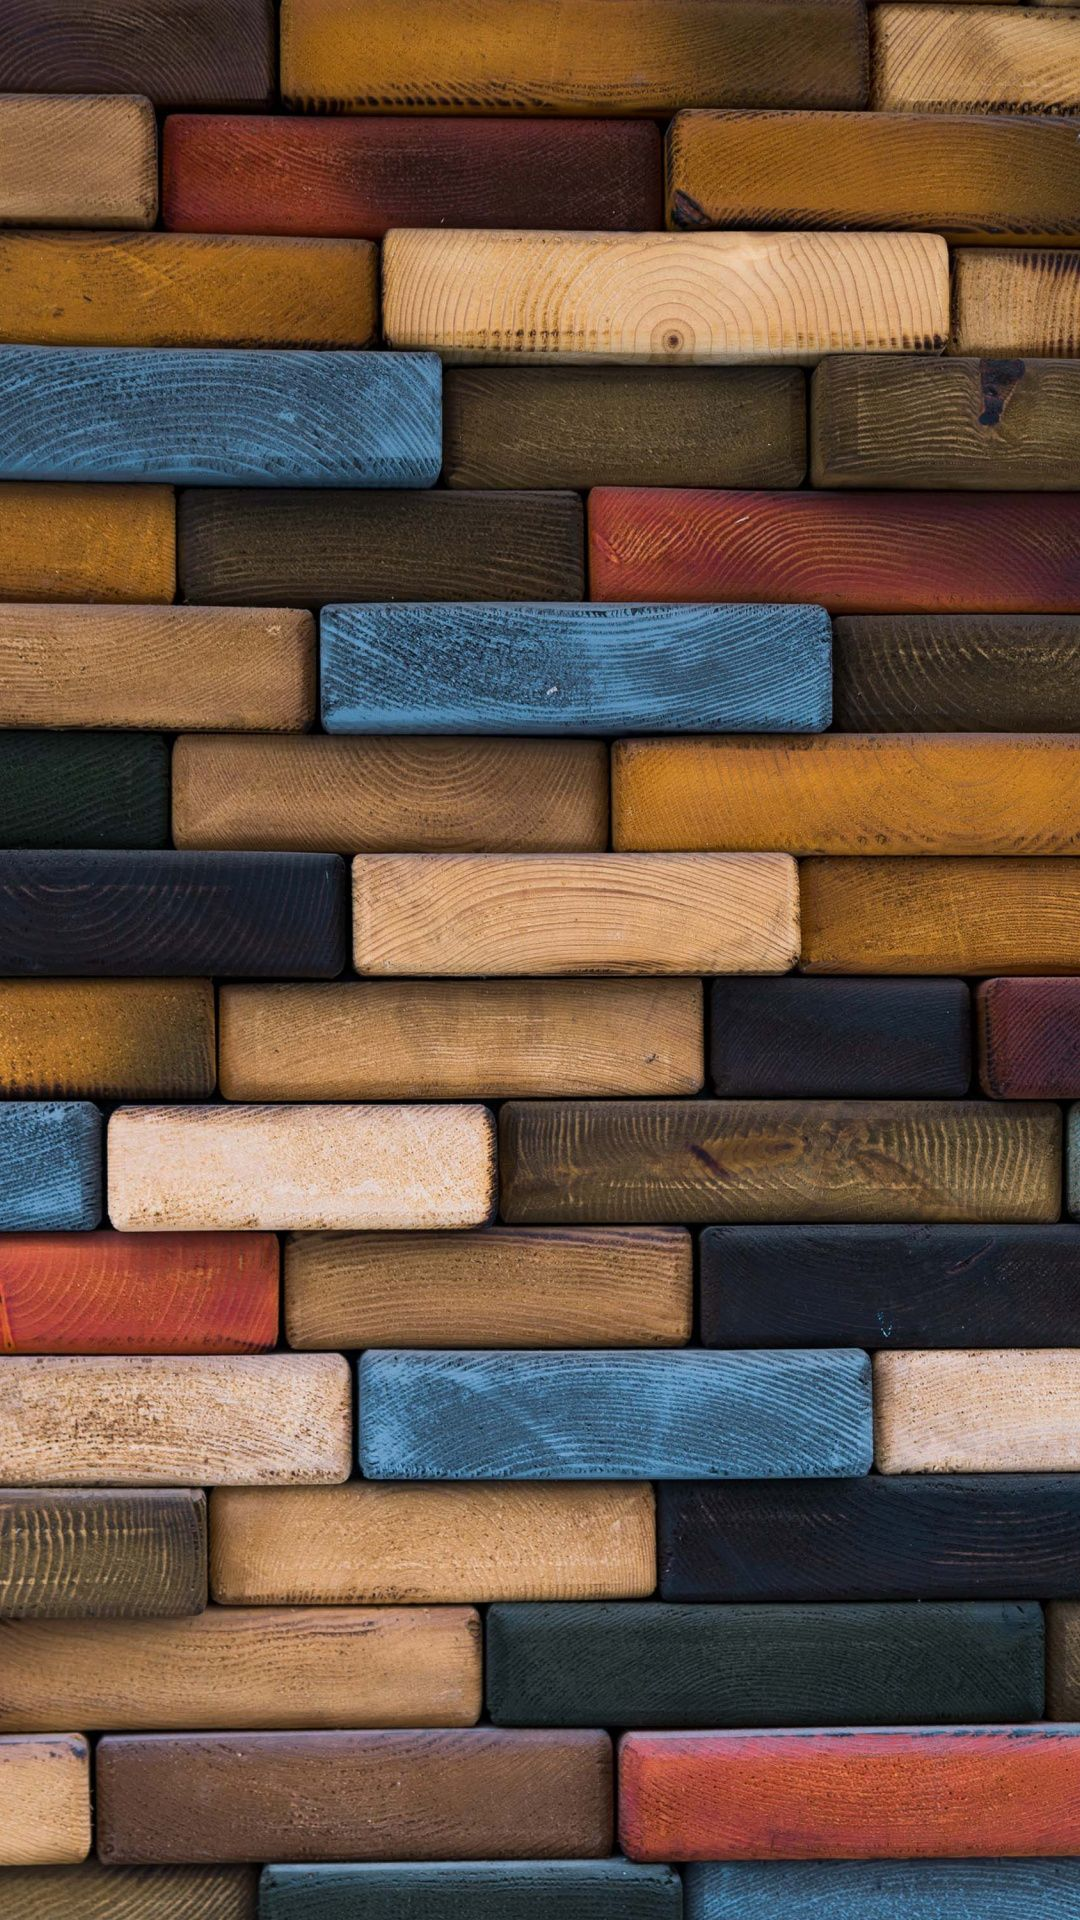 1080x1920 Texture Colorful Bricks Blocks Wallpaper Brick Wall Wallpaper Iphone Wallpaper Texture Brick Wallpaper Iphone